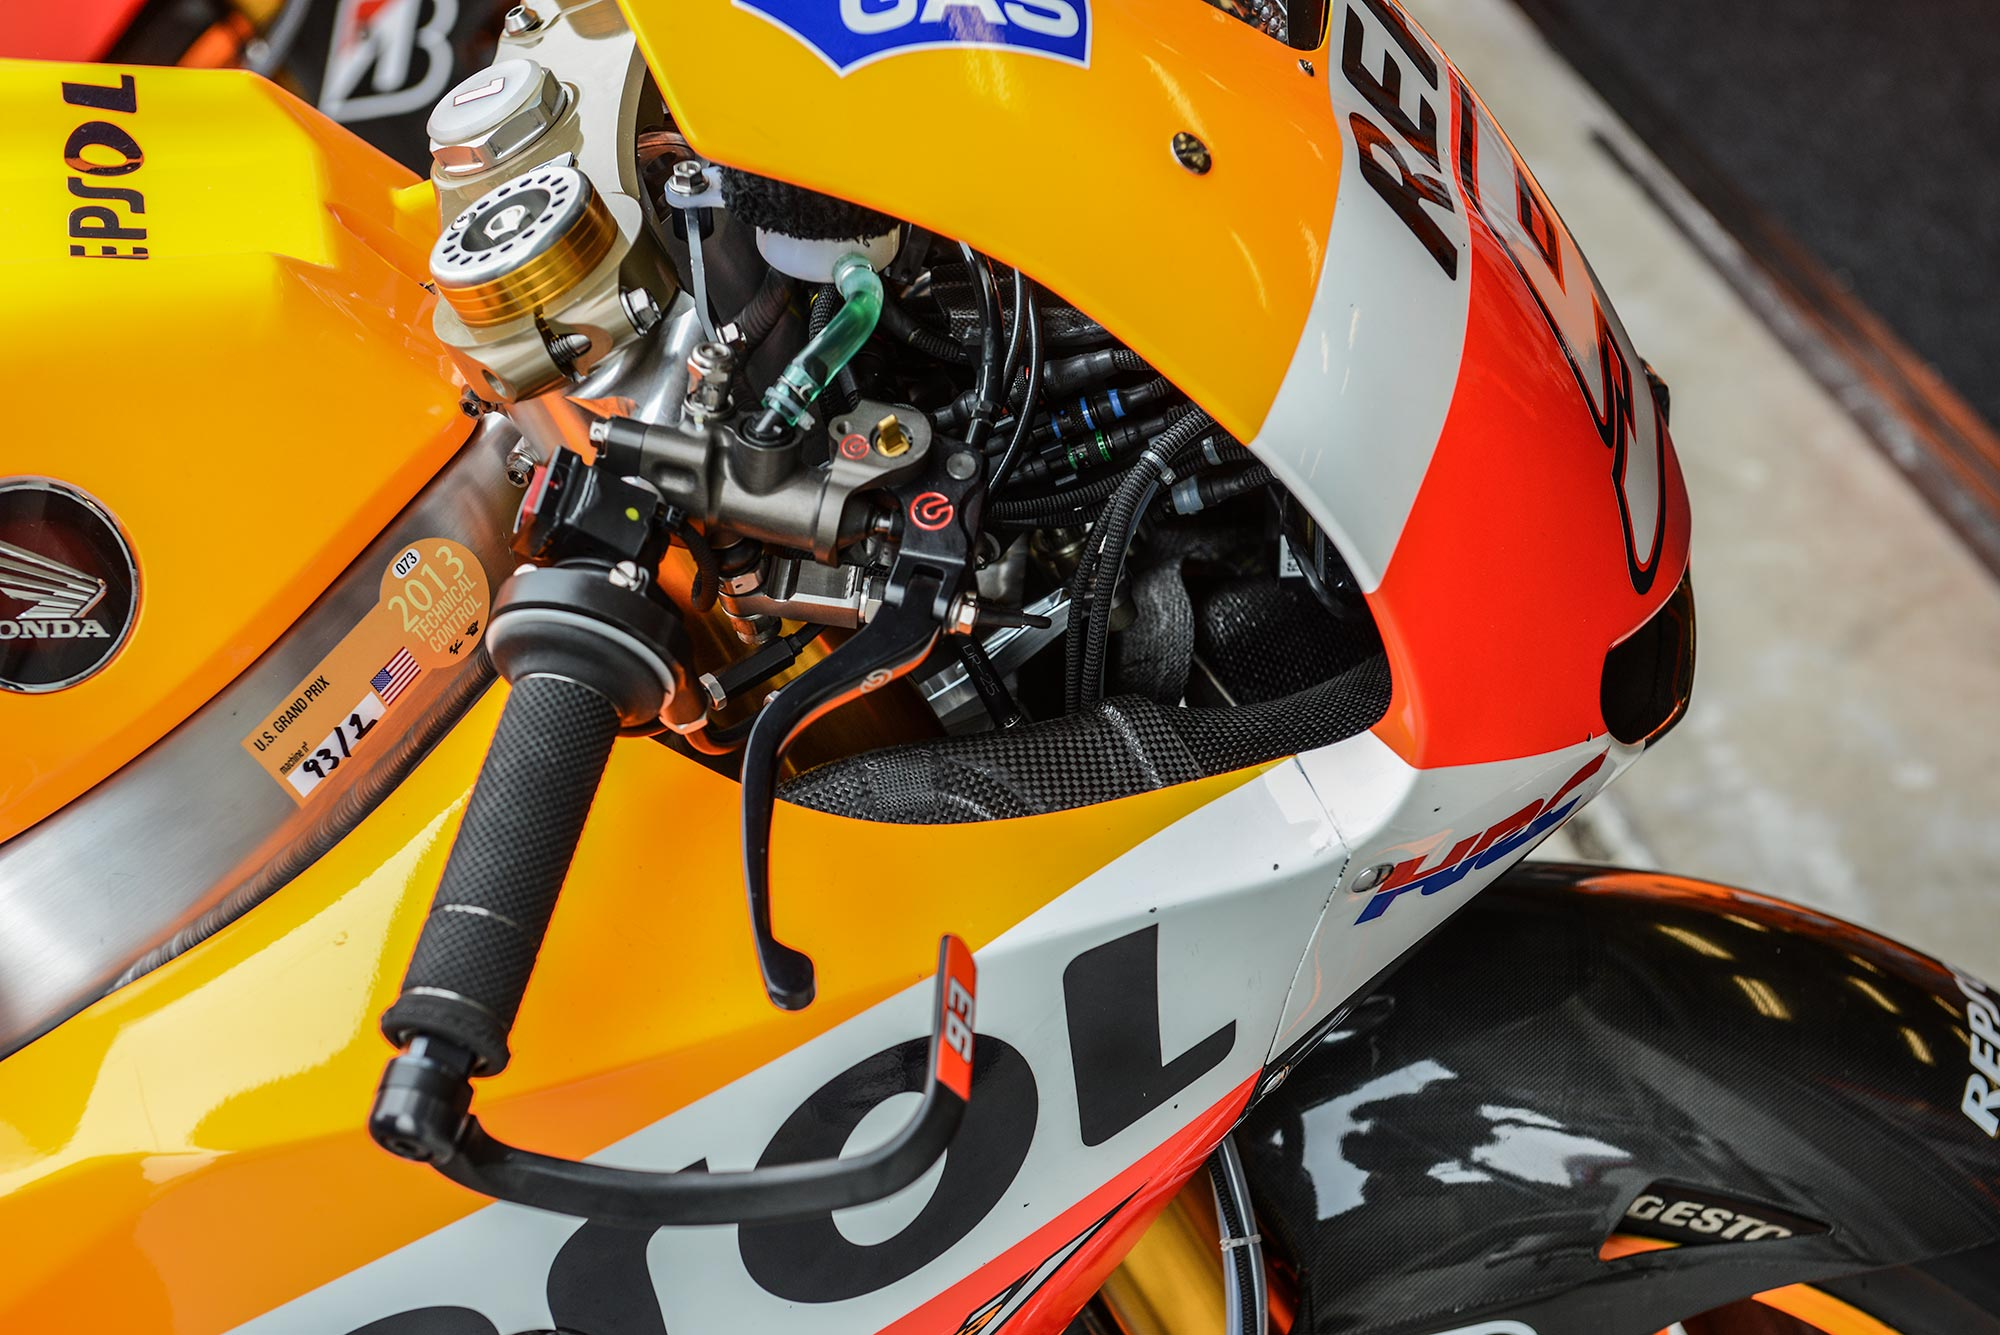 Honda-RC213V-MotoGP-Laguna-Seca-Jensen-Beeler-9.jpg